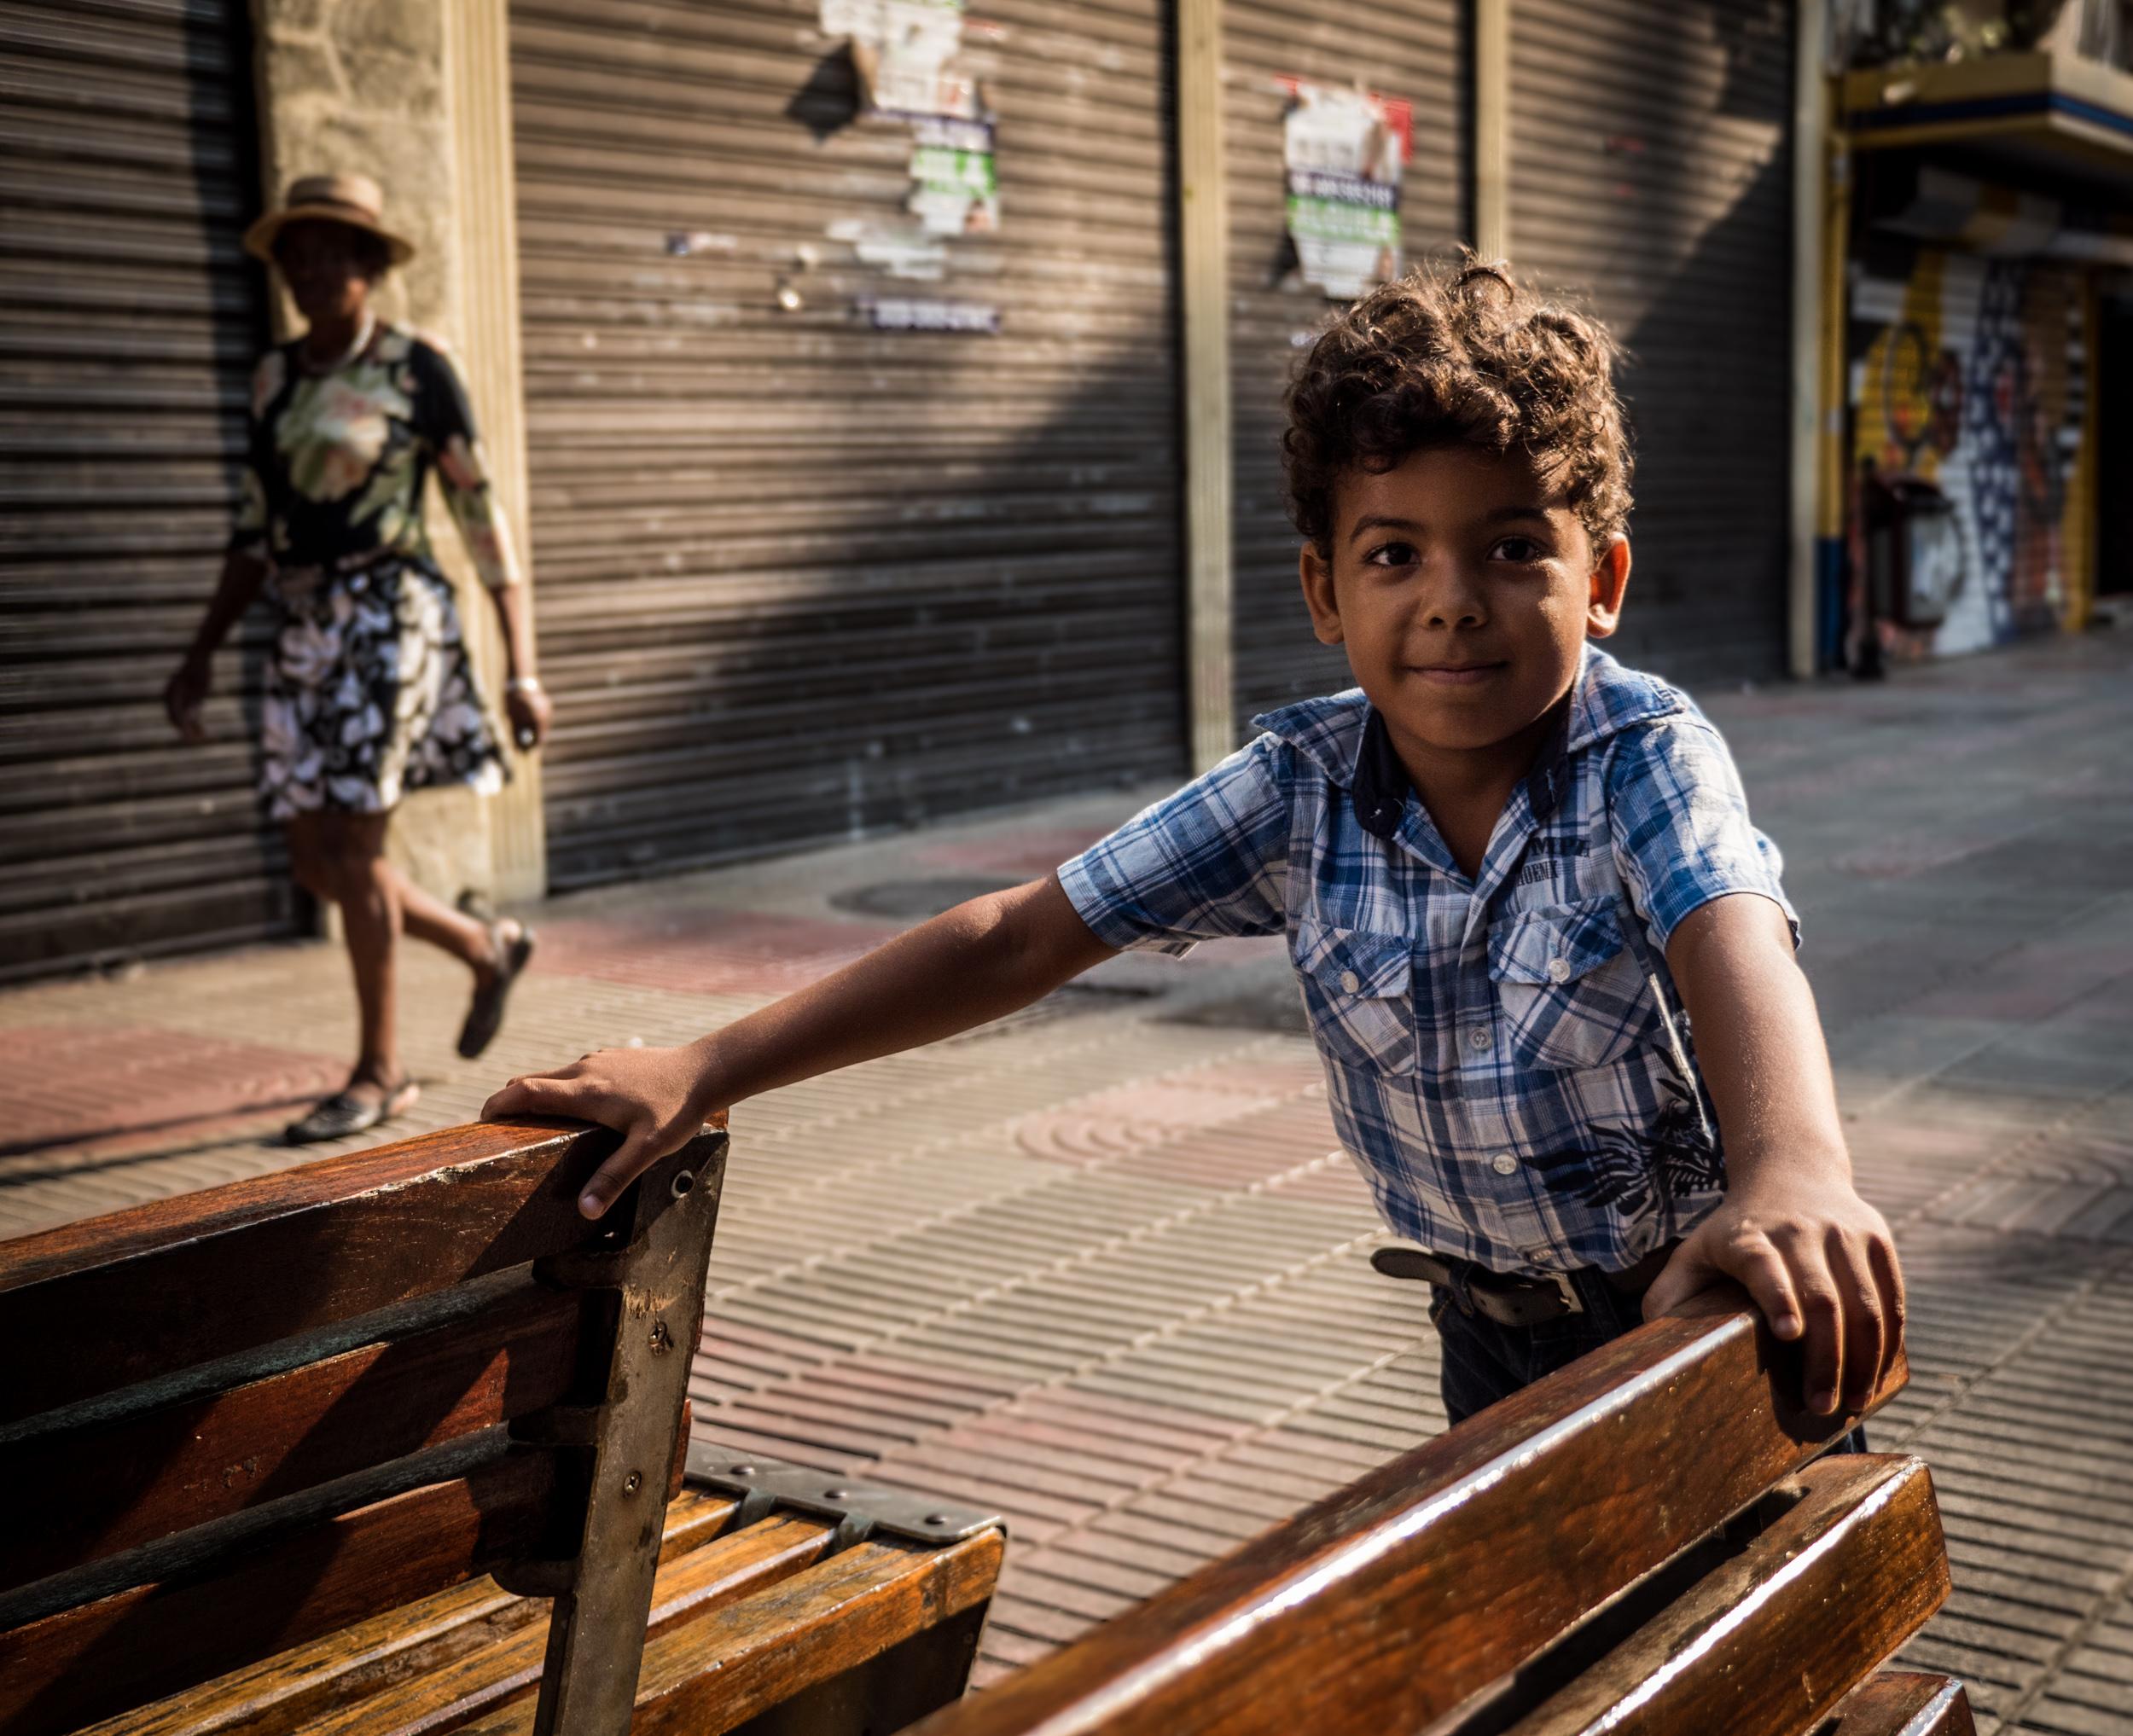 _16 Curious Boy Sun Shadows Streets Dominican Republic.jpg